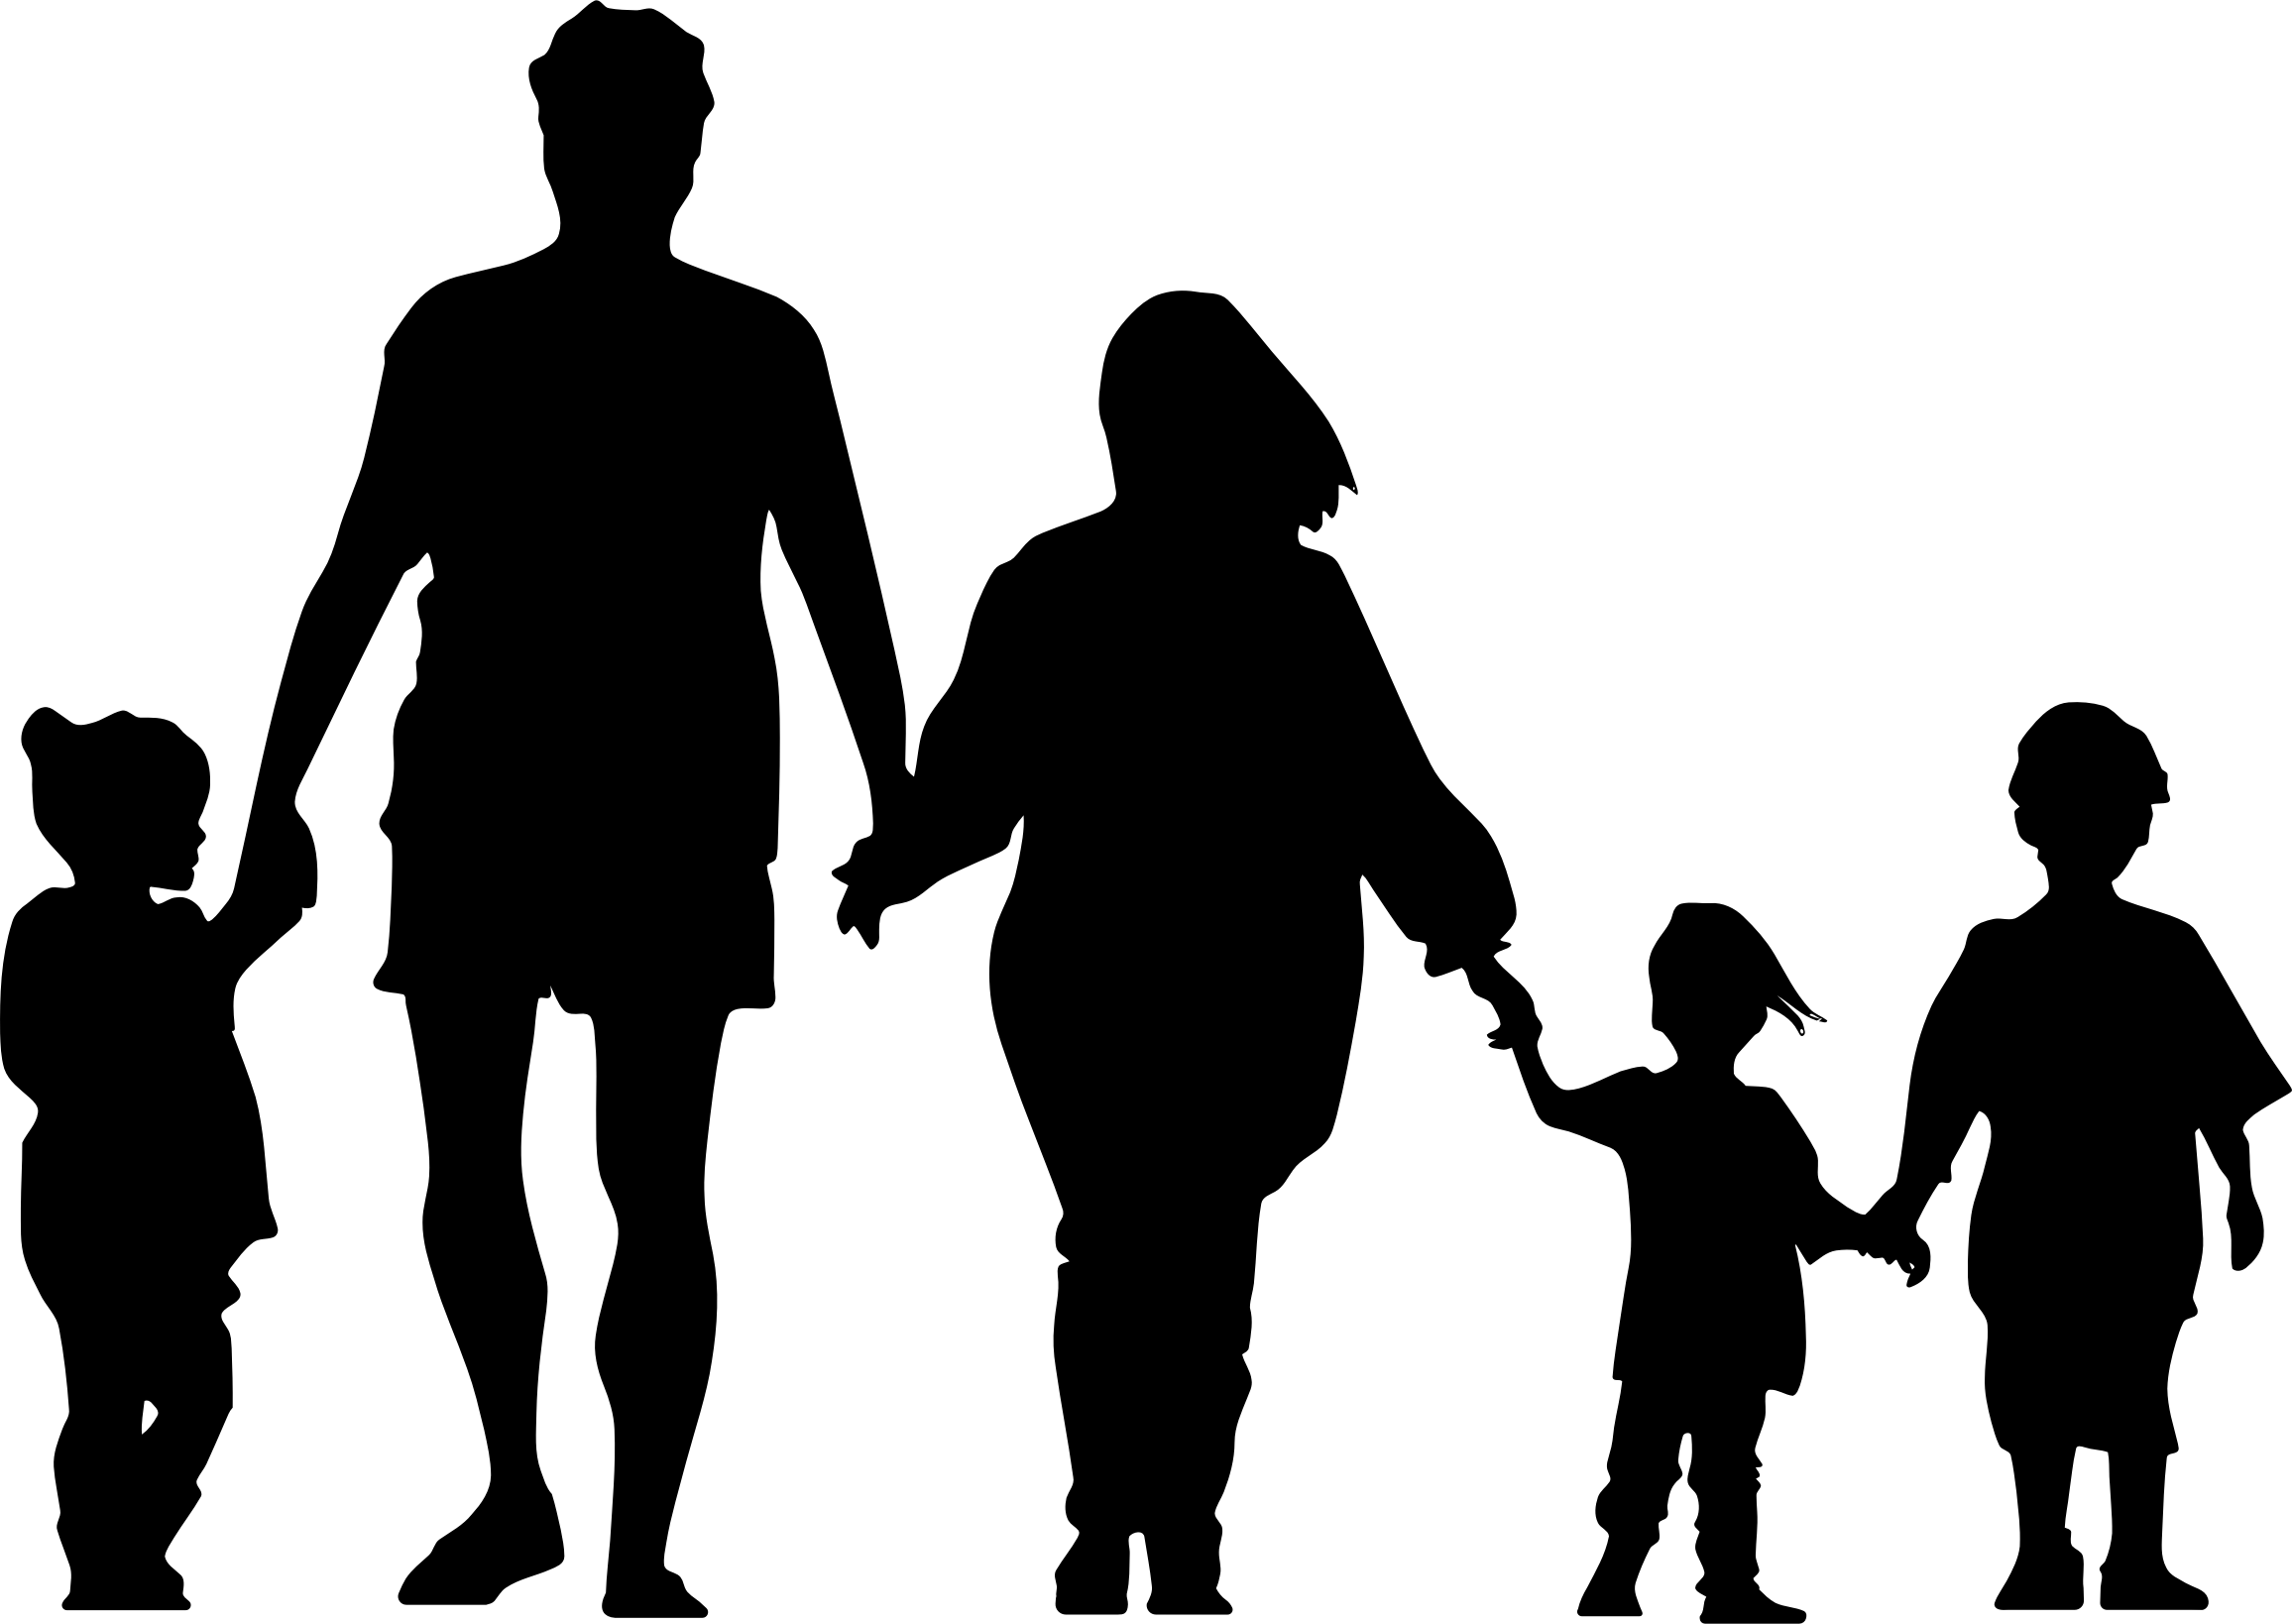 2312x1638 Clipart